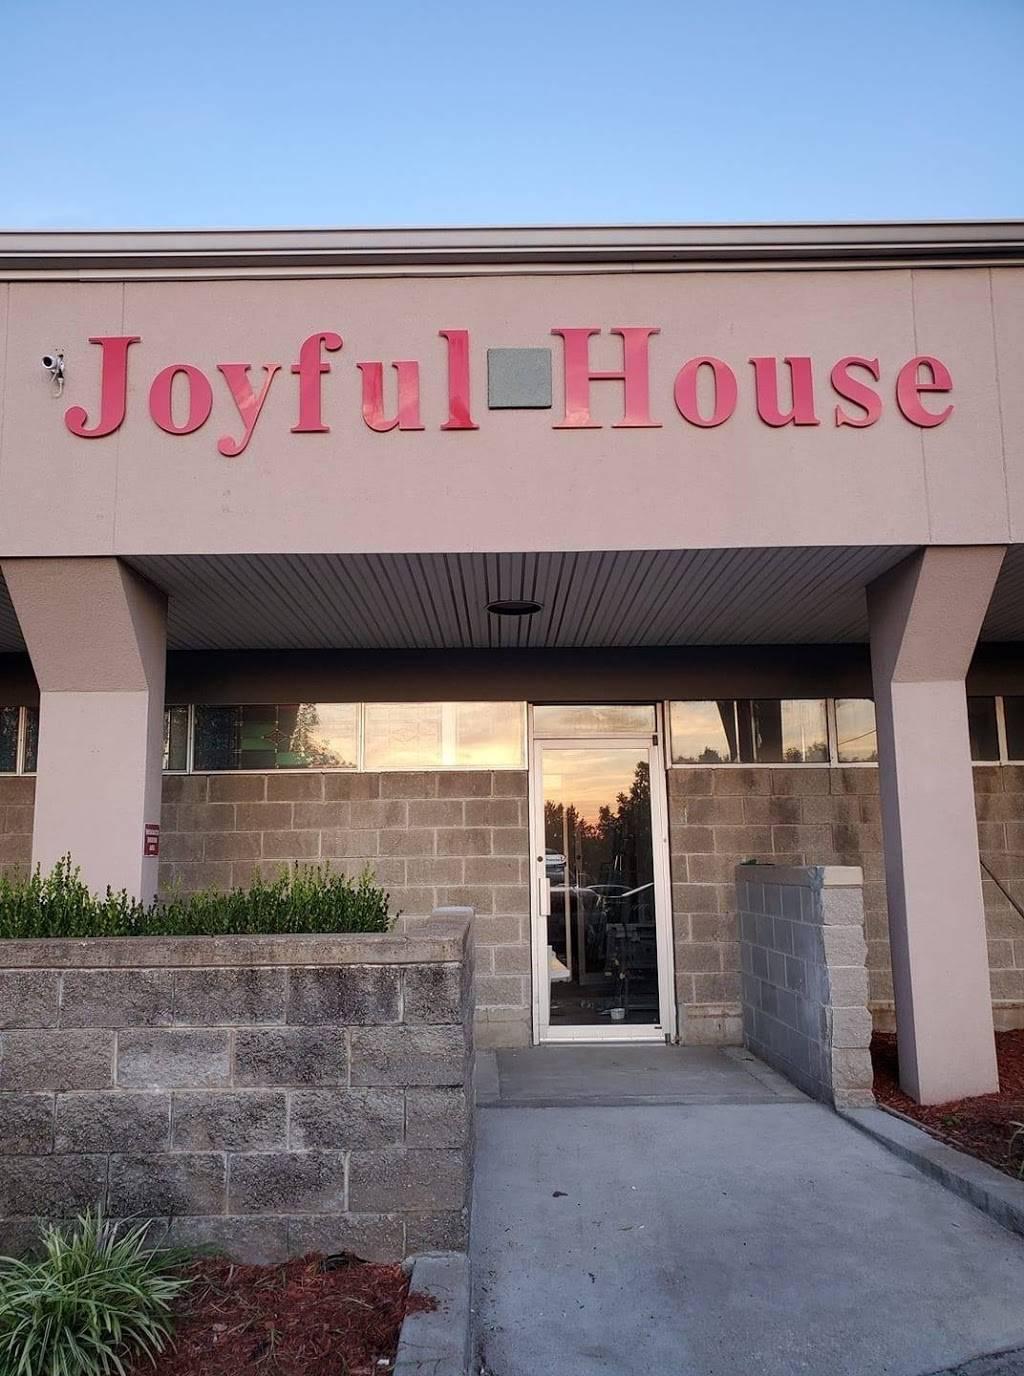 Joyful House Vietnamese Cuisine and Seafood - cafe  | Photo 1 of 9 | Address: 3900 S Grand Blvd, St. Louis, MO 63118, USA | Phone: (314) 696-8255